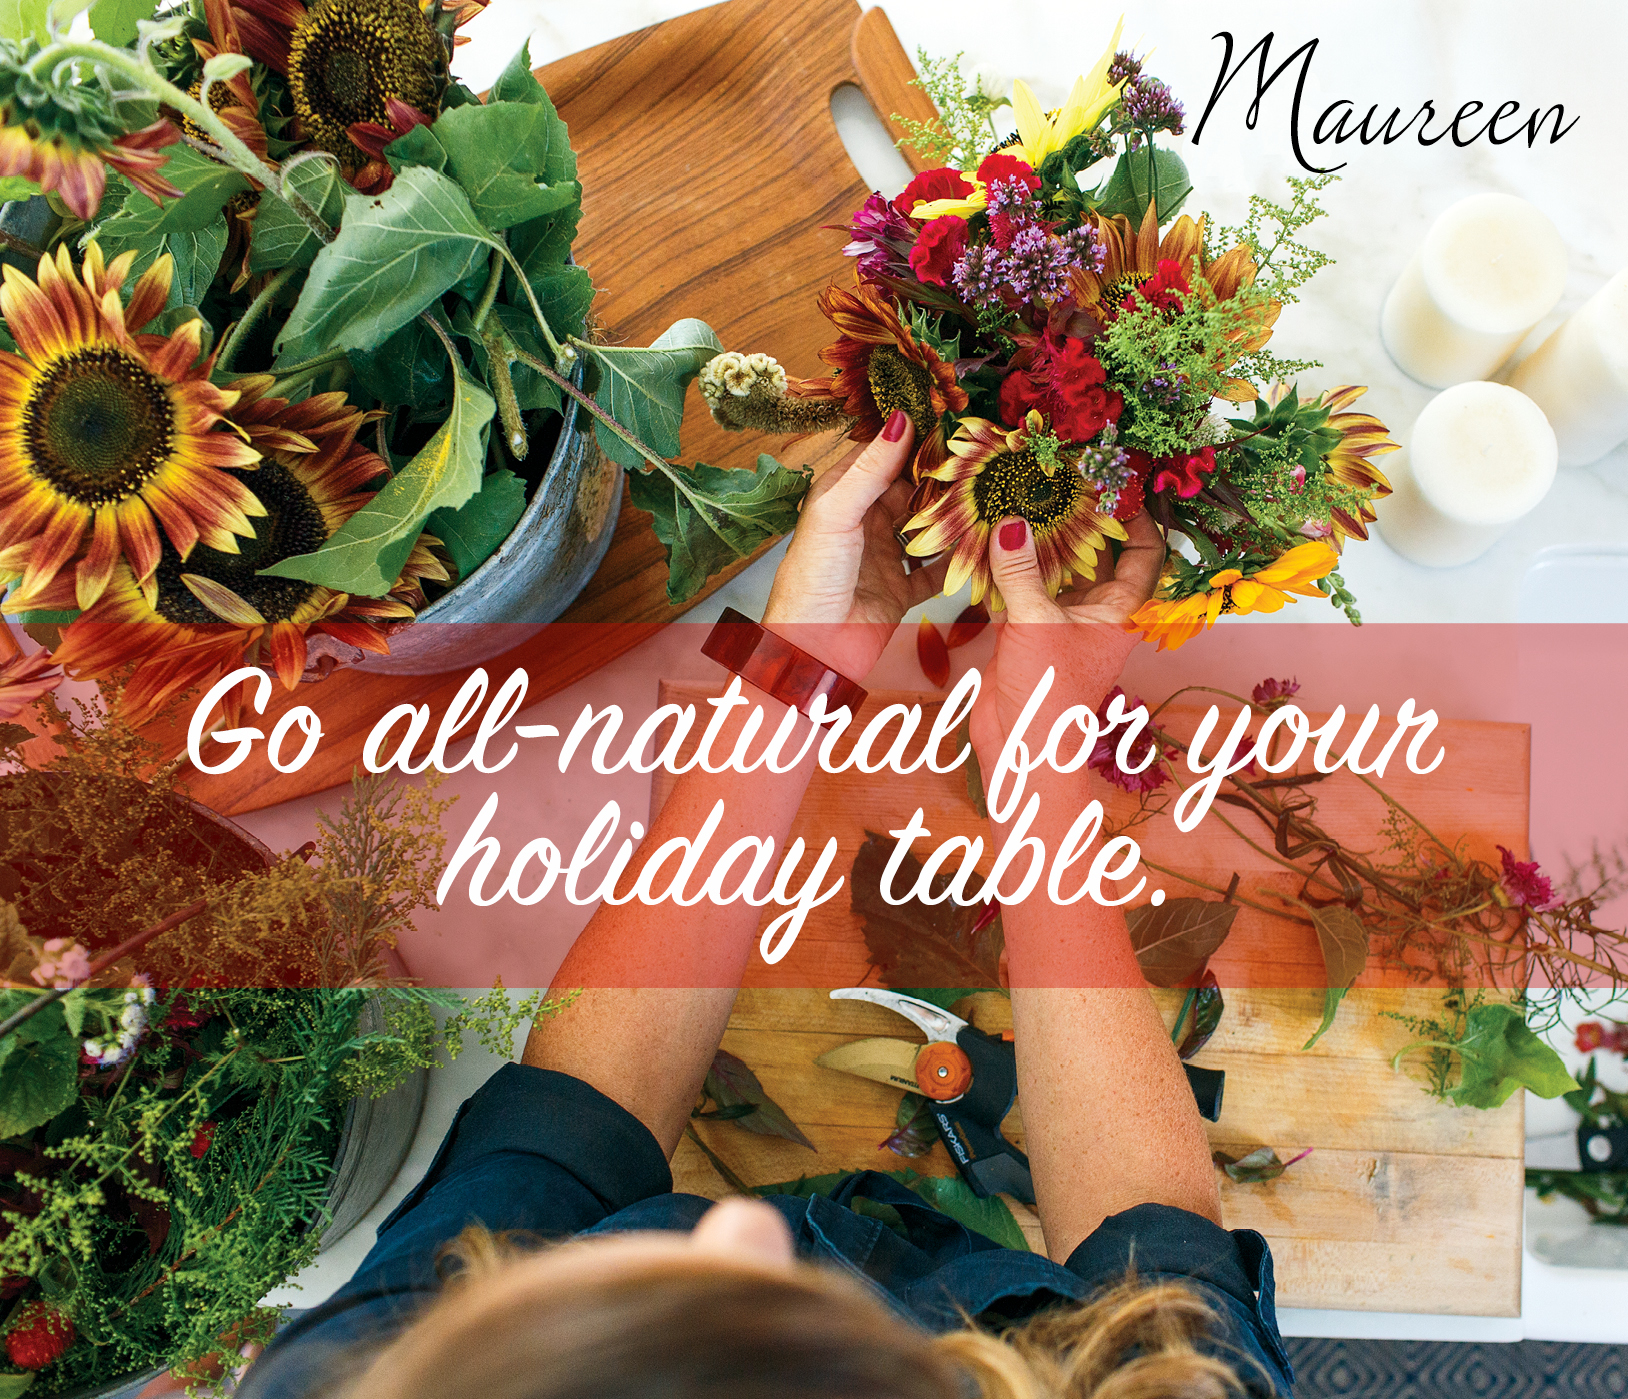 Holiday-table-meme.jpg